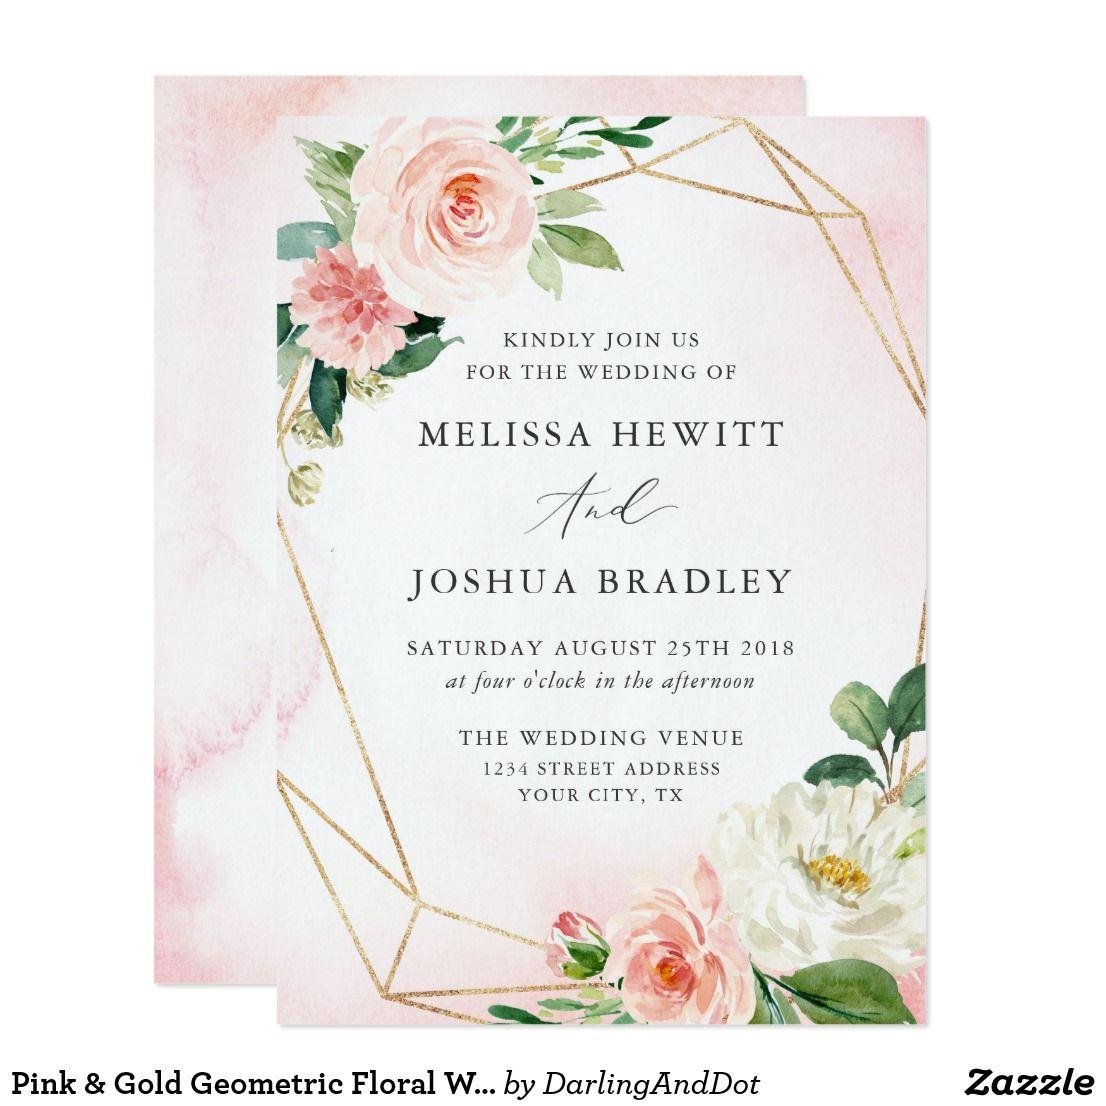 Pink Gold Geometric Floral Wedding Invitation Zazzle Ca Floral Wedding Invitations Geometric Wedding Invitation Pink And Gold Wedding